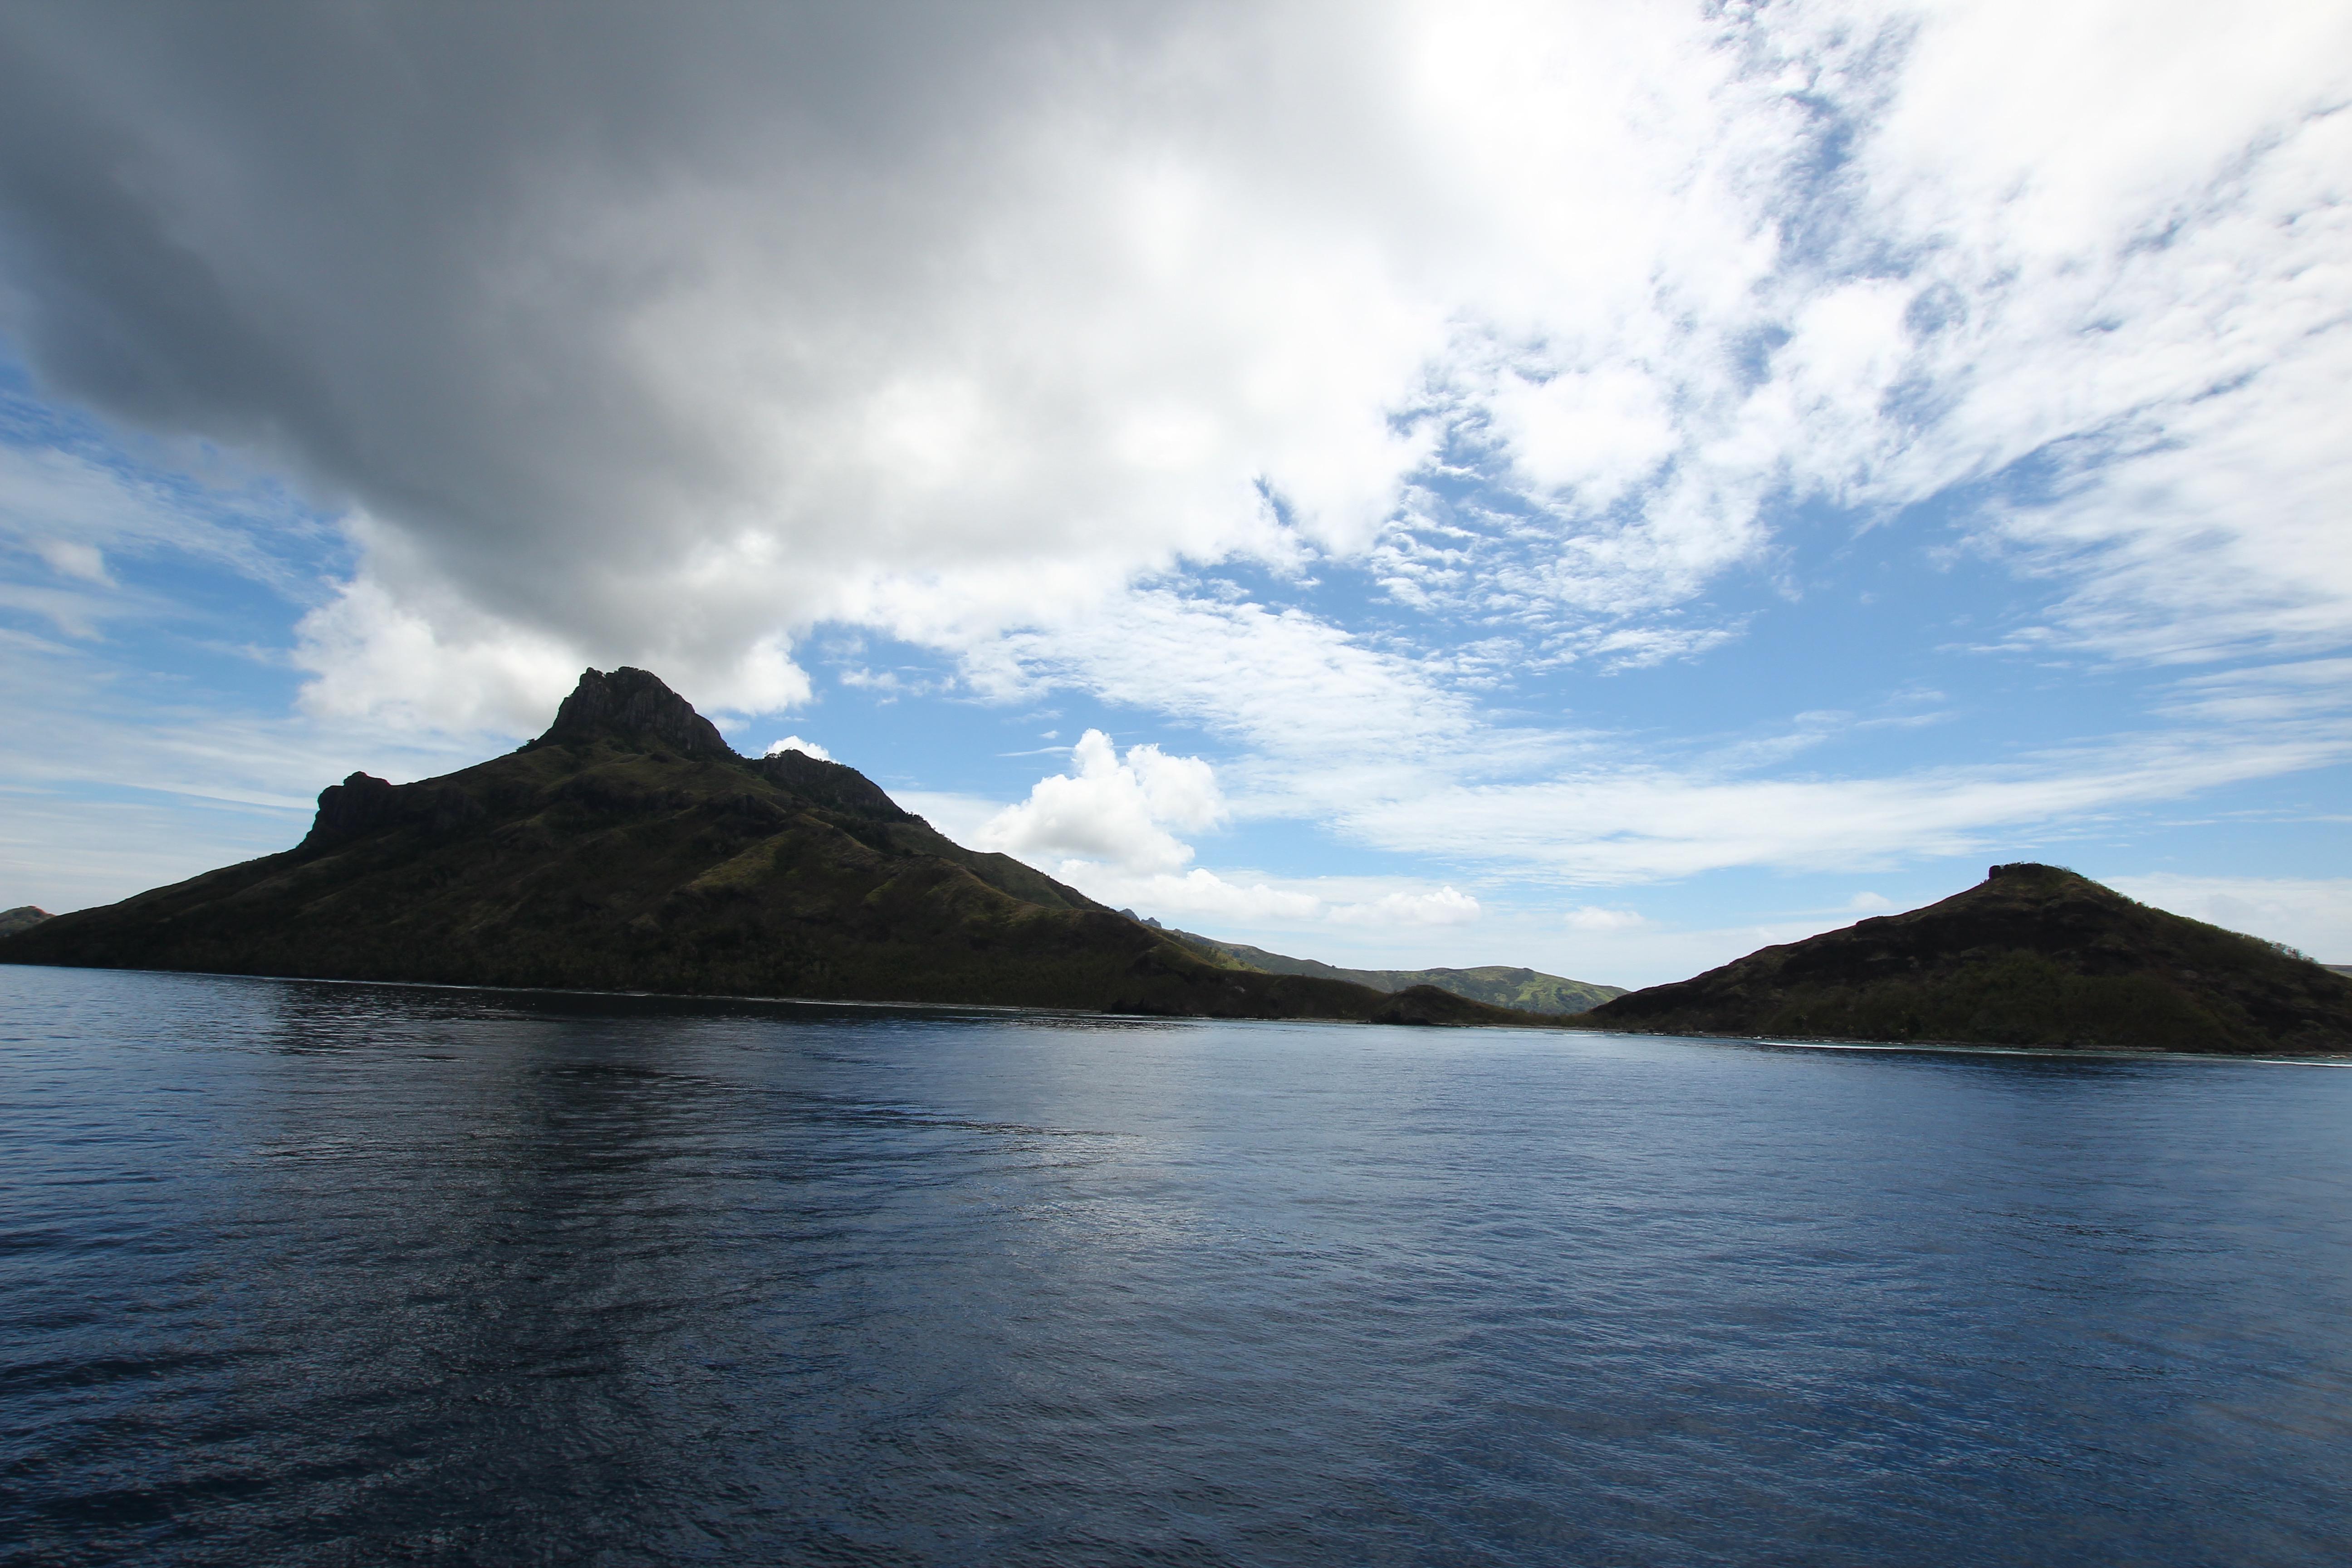 Occtupus island